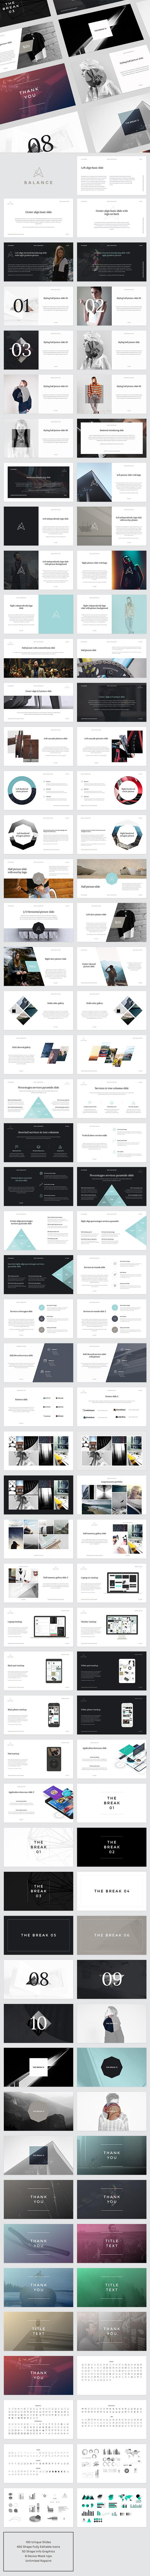 BALANCE Keynote Presentation - Creative Keynote Templates